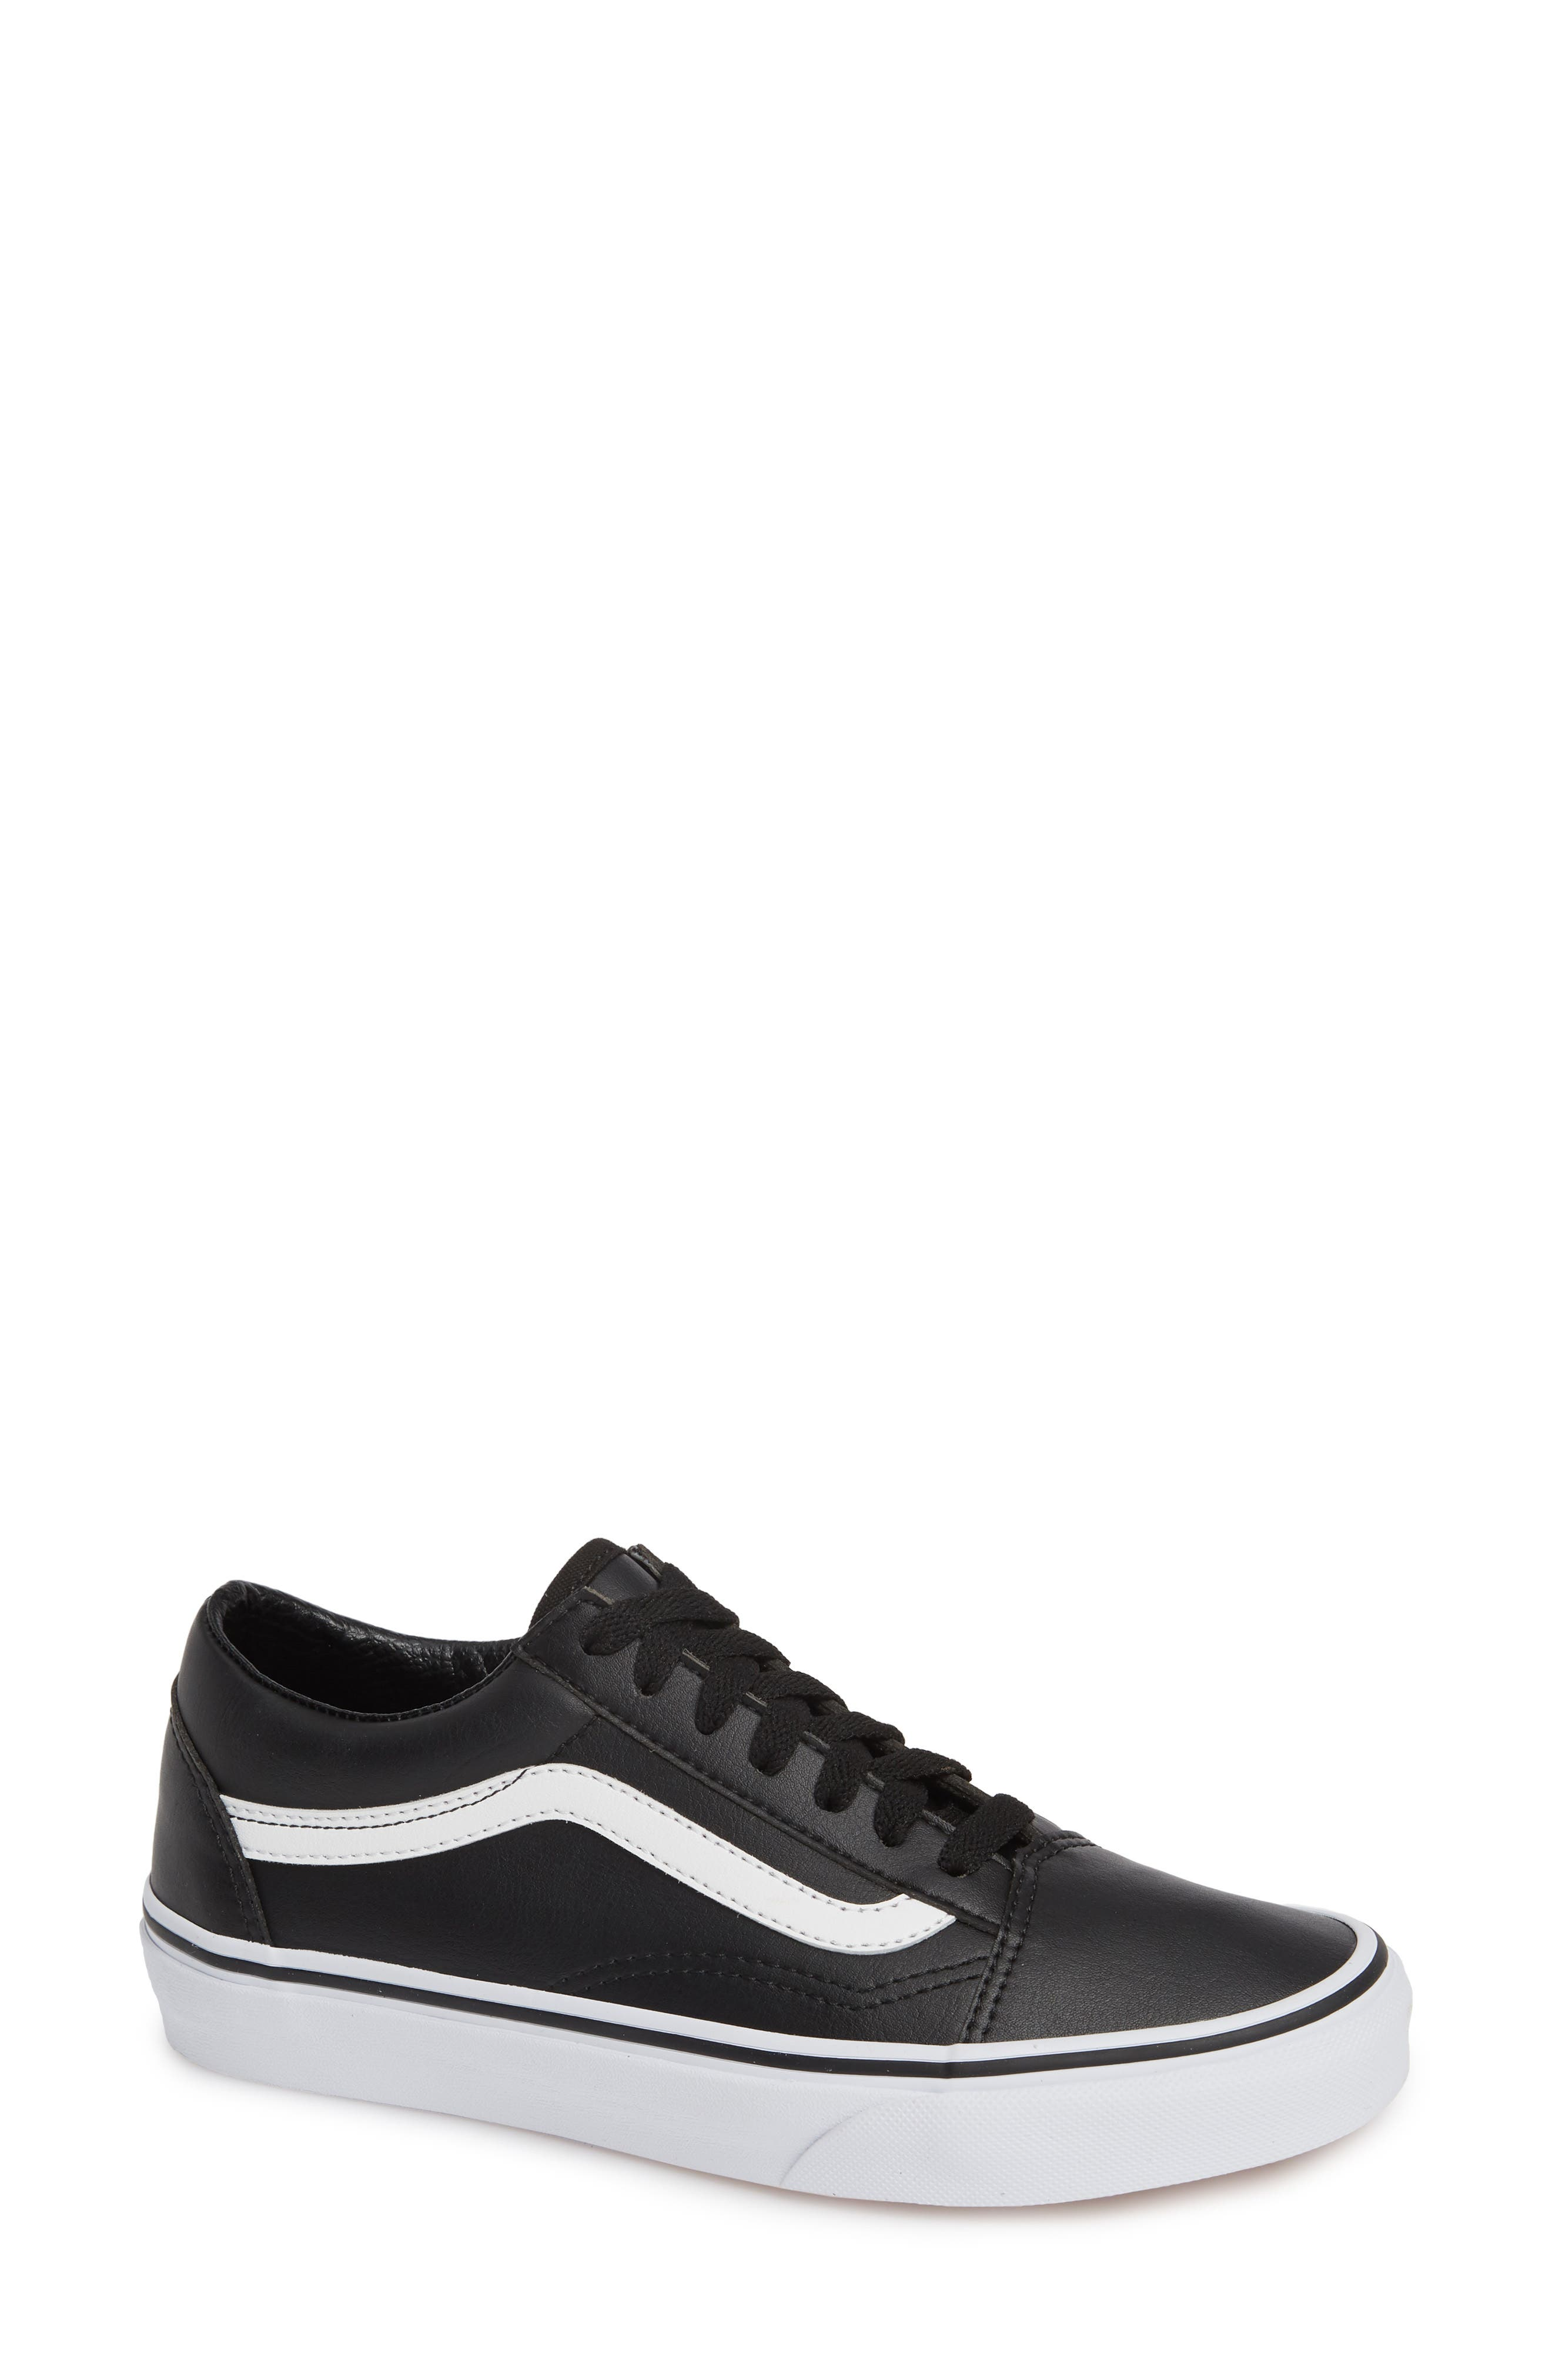 Old Skool Tumble Sneaker, Main, color, BLACK/ TRUE WHITE